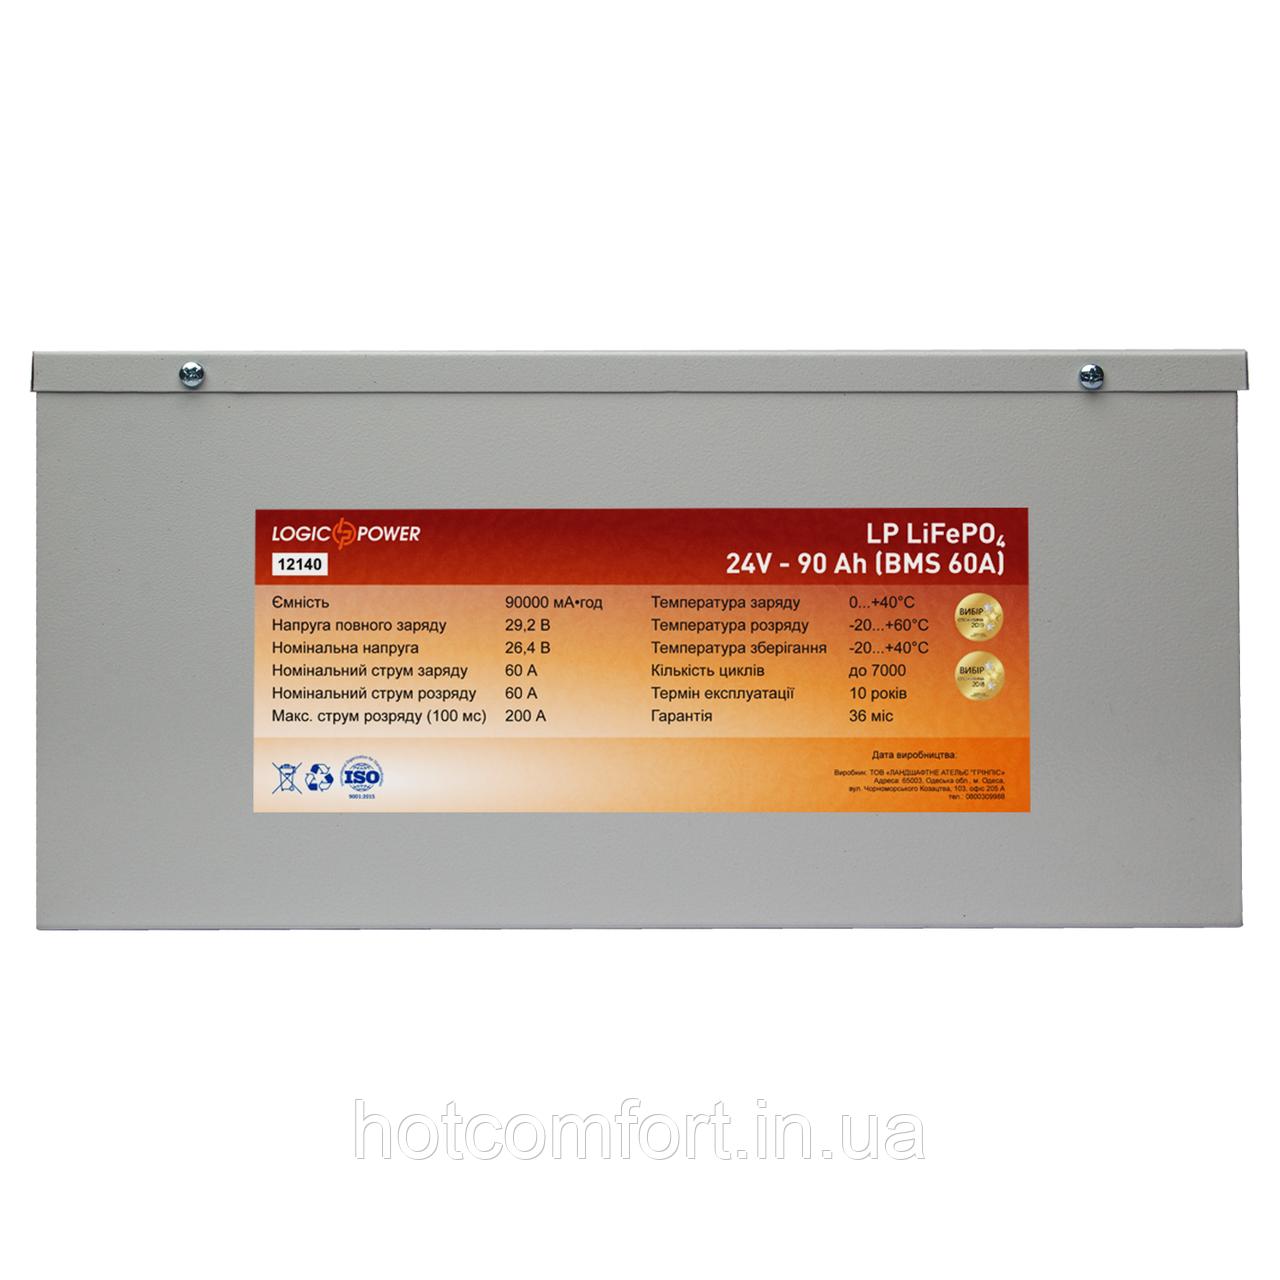 Аккумулятор LP LiFePO4 24V - 90 Ah (BMS 60A) металл